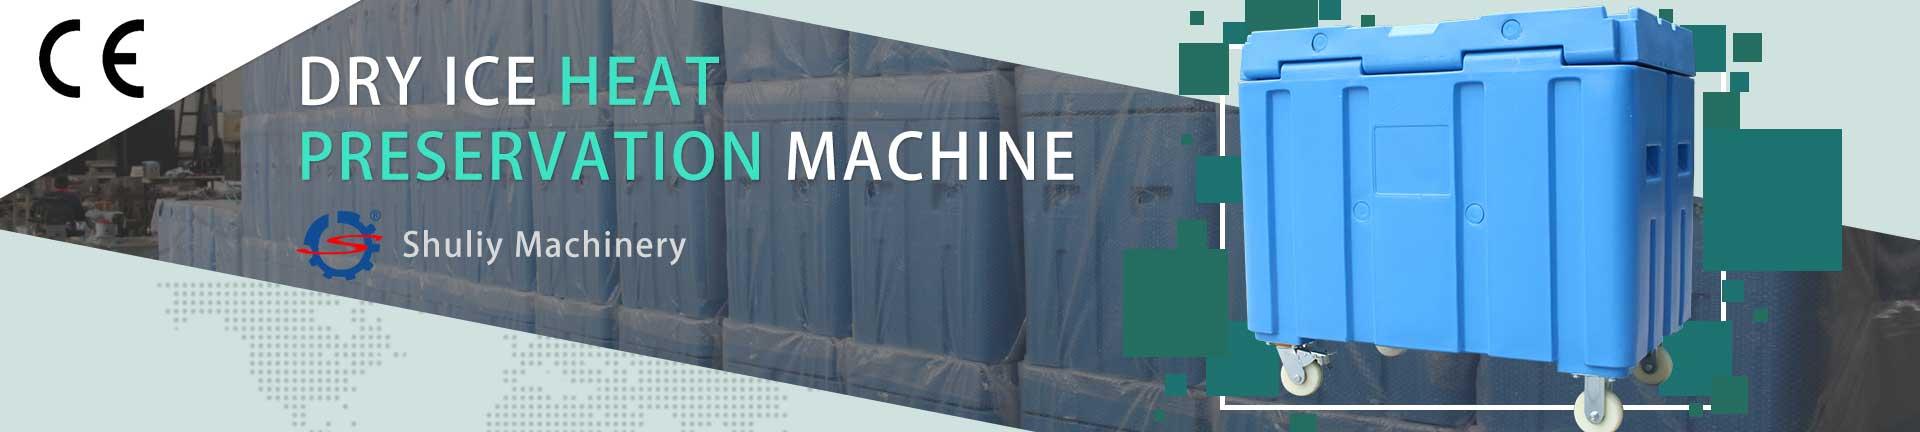 DRY-ICE-HEAT–PRESERVATION-MACHINE